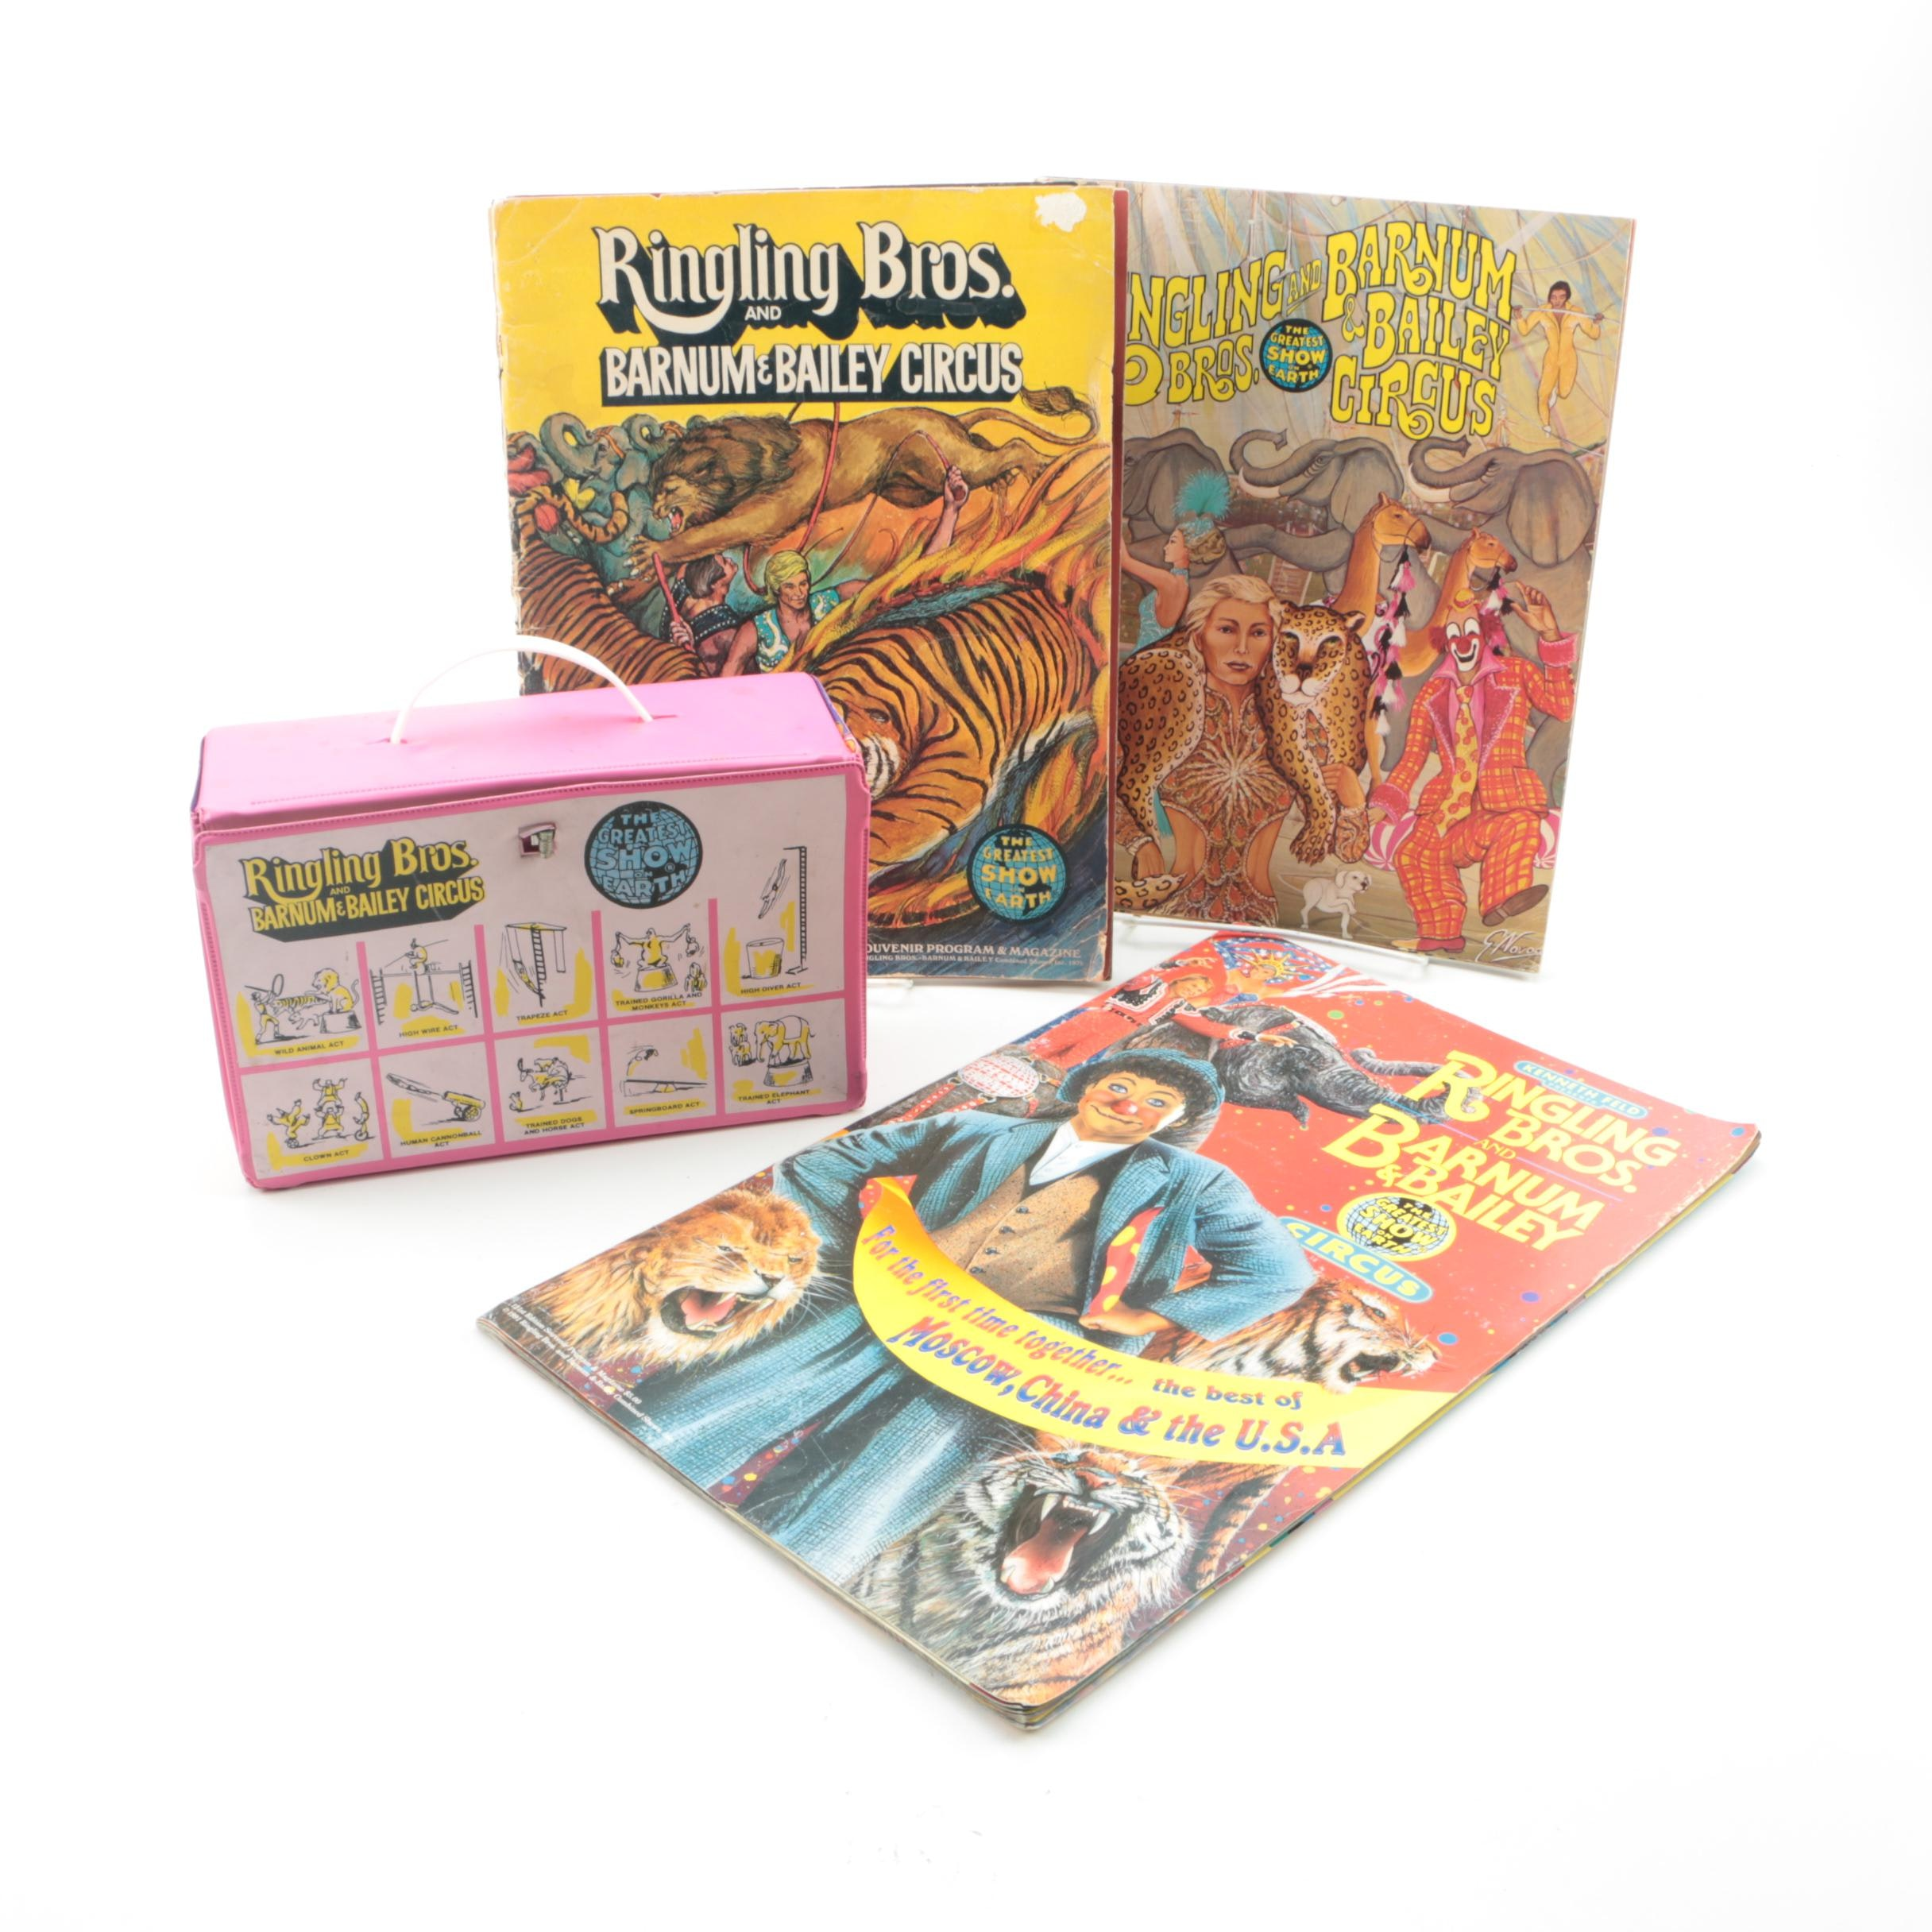 Ringling Bros. and Barnum & Bailey Circus Souvenir Programs and Play Set